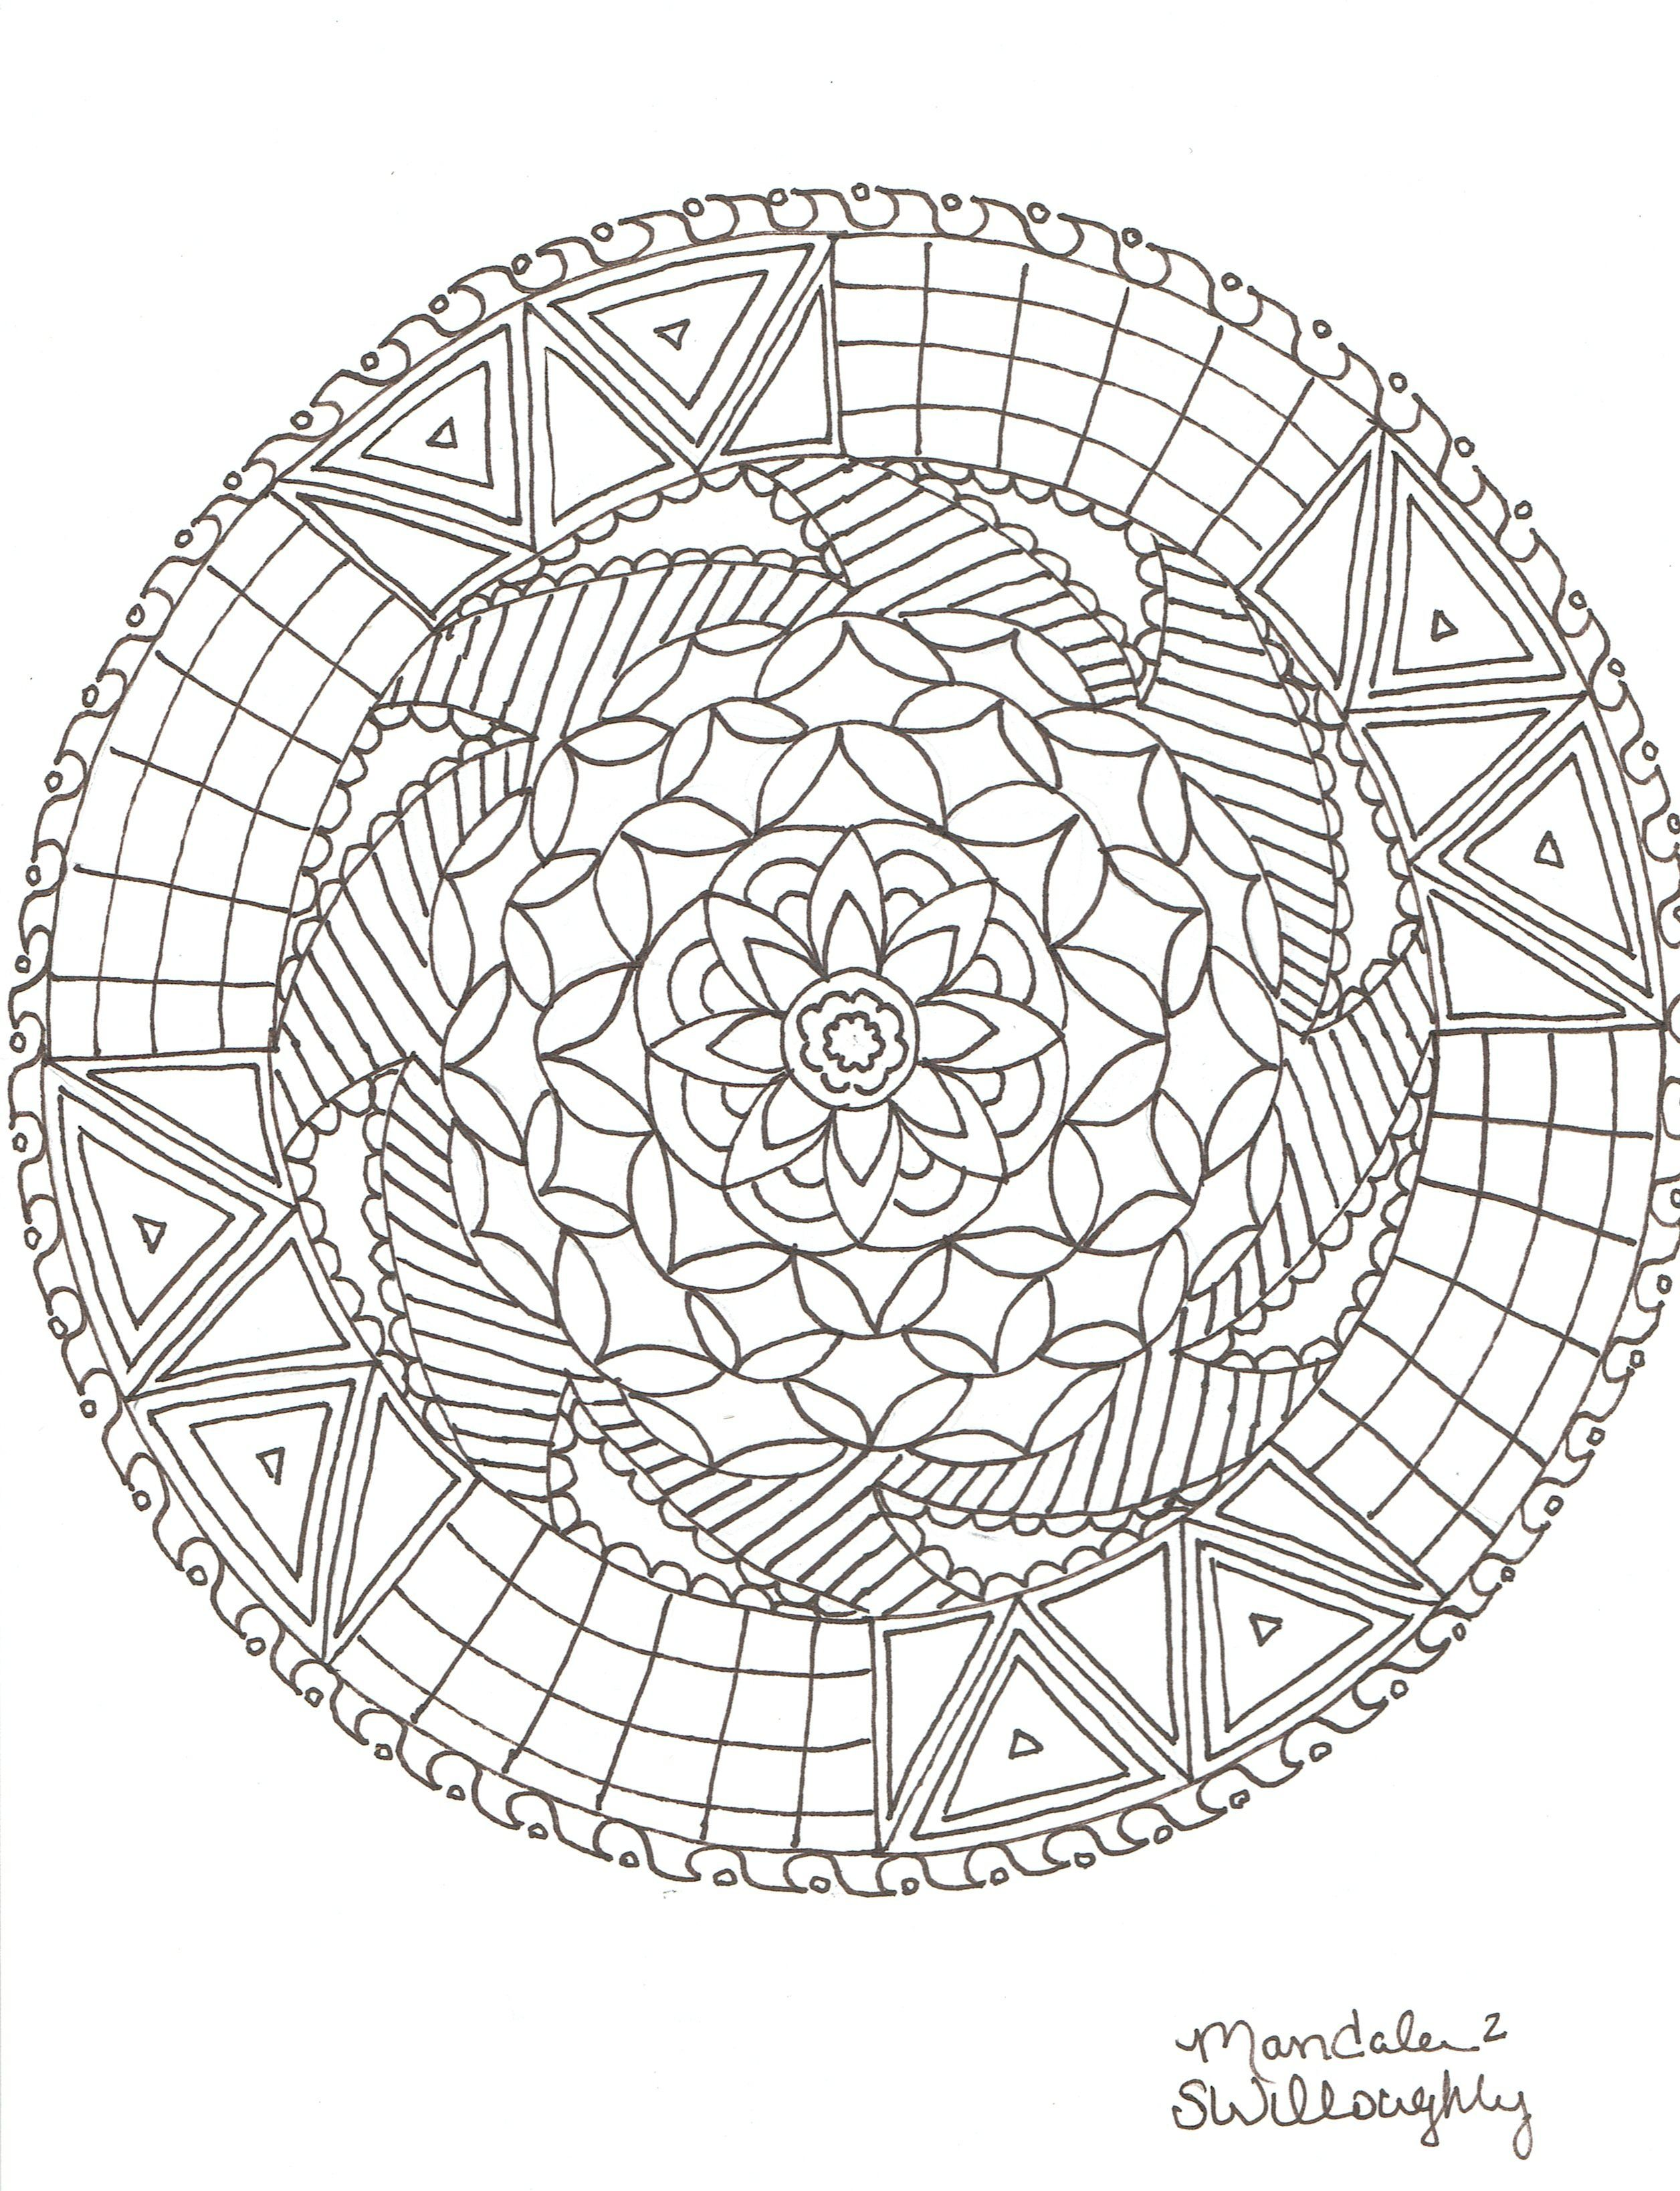 Mandala coloring page by SW   Mandalas   Pinterest   Mandala ...